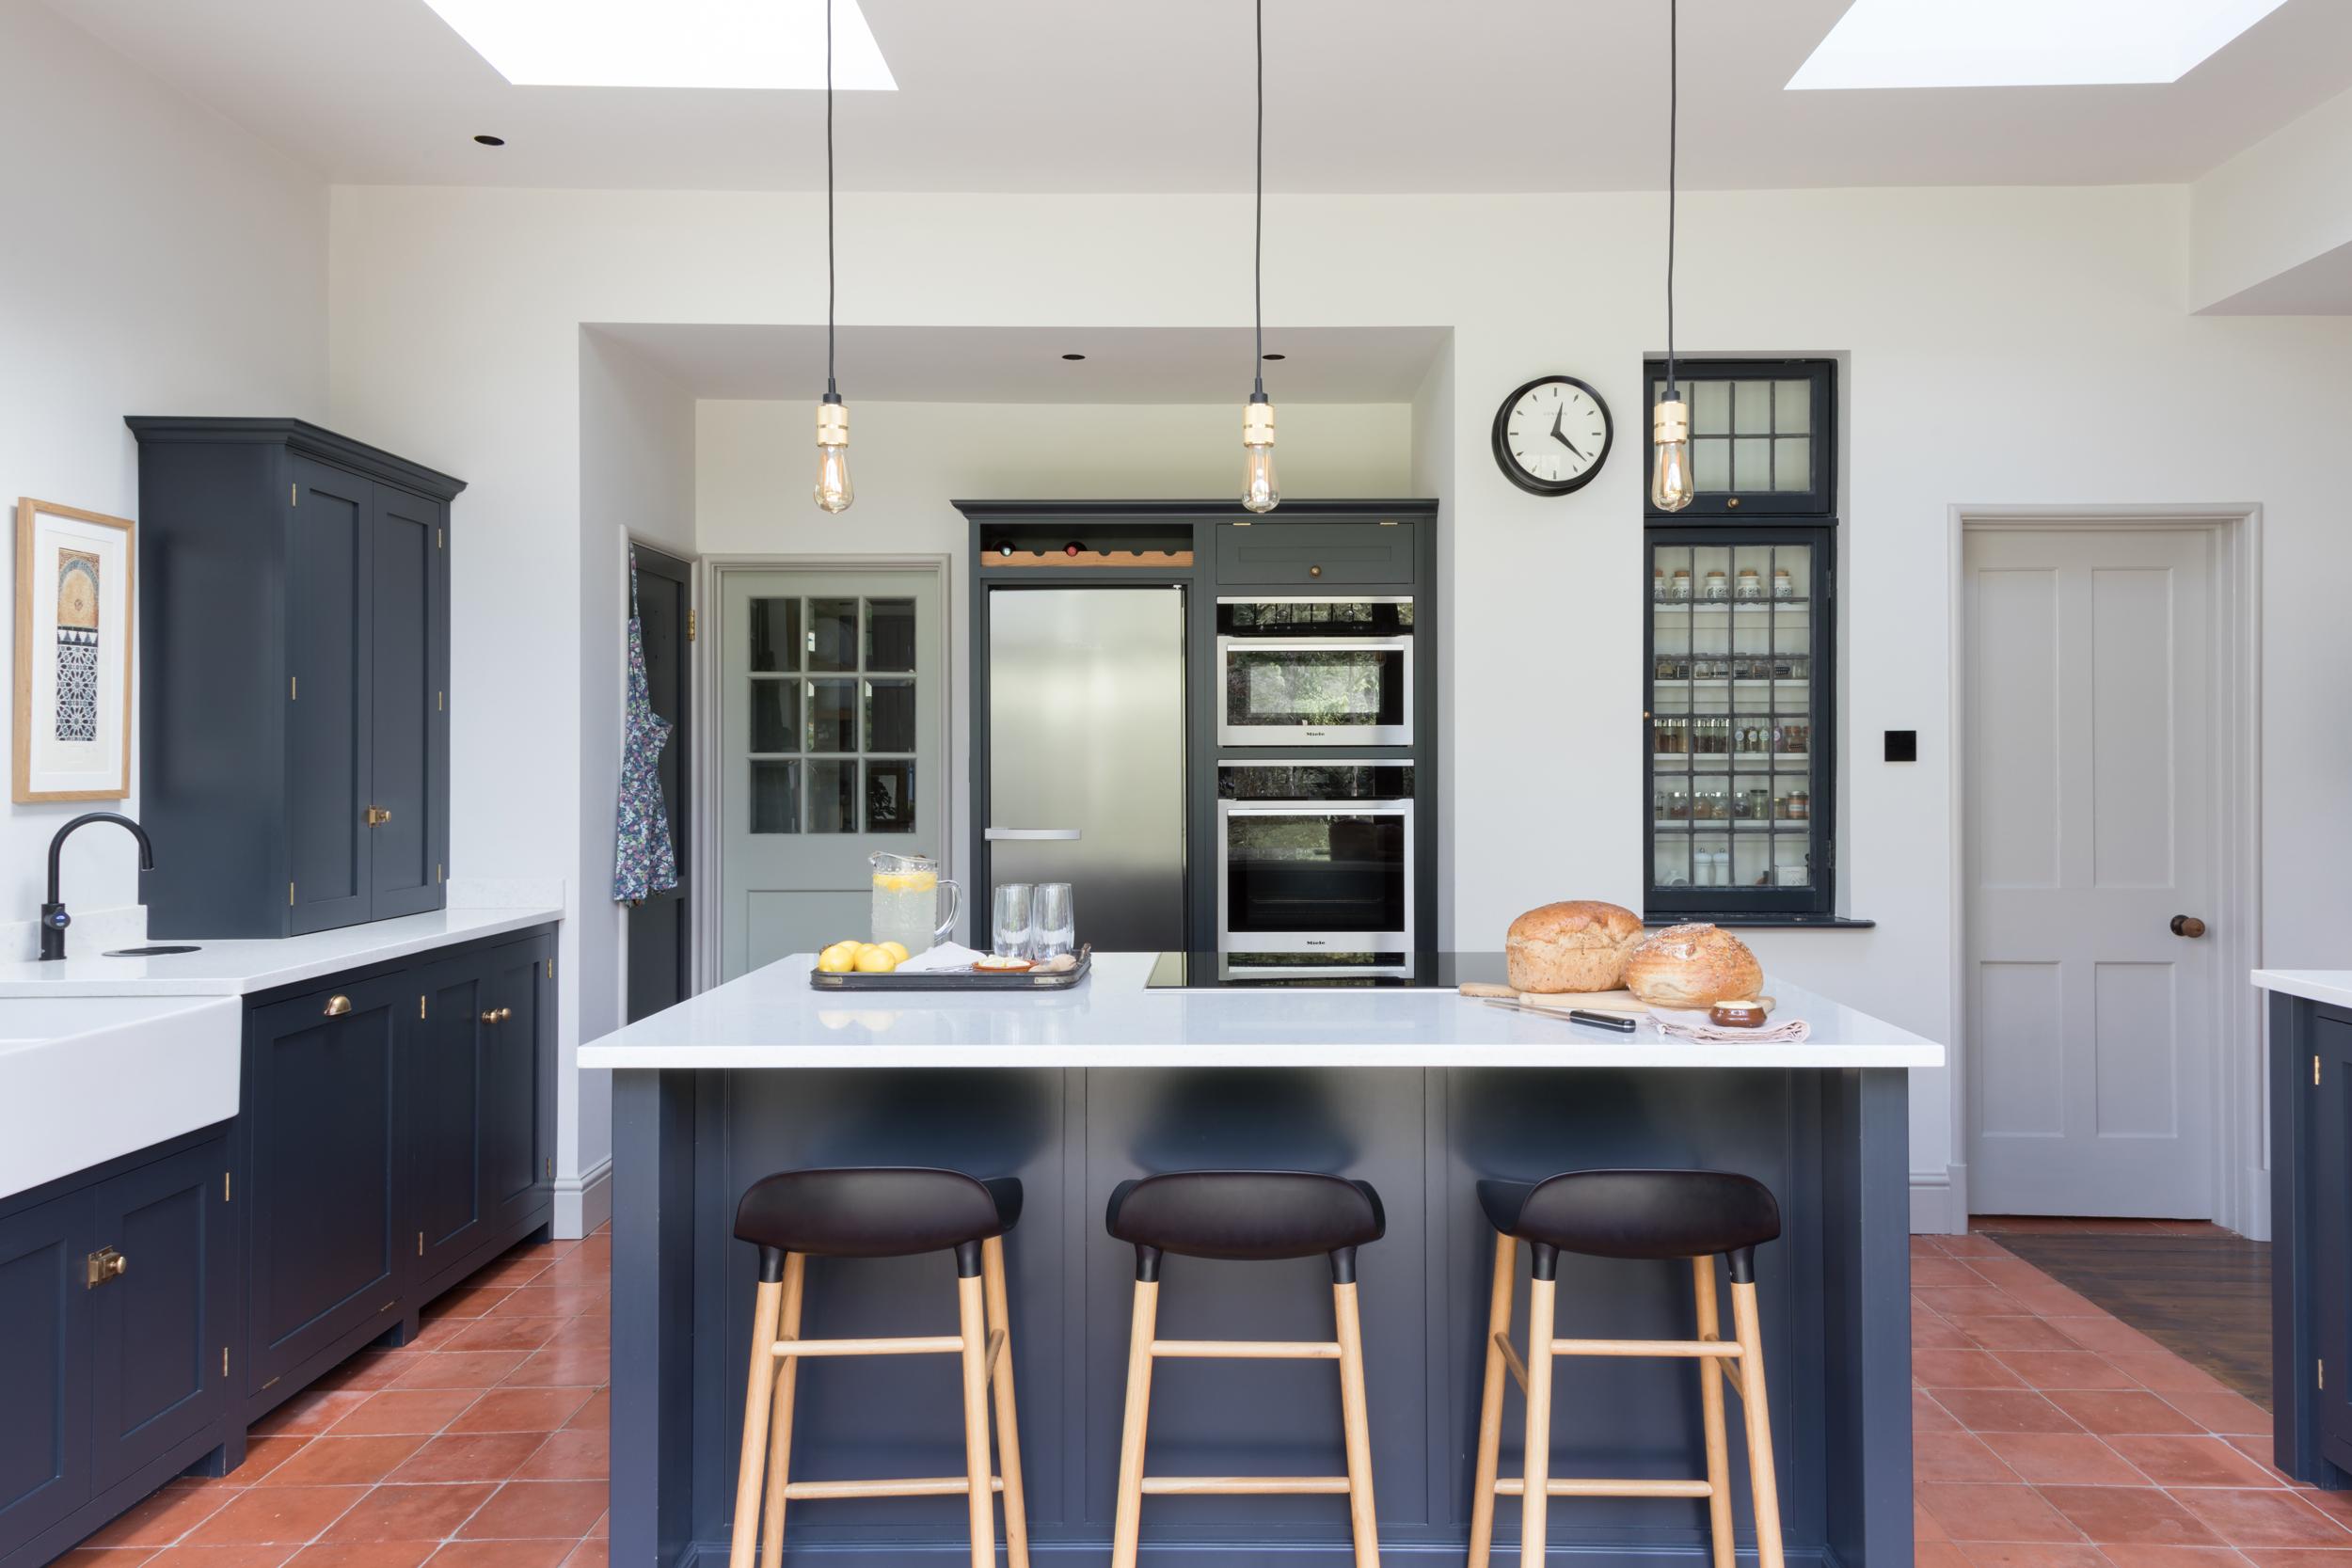 kitchen-design-with-bar-stools-aai.jpg